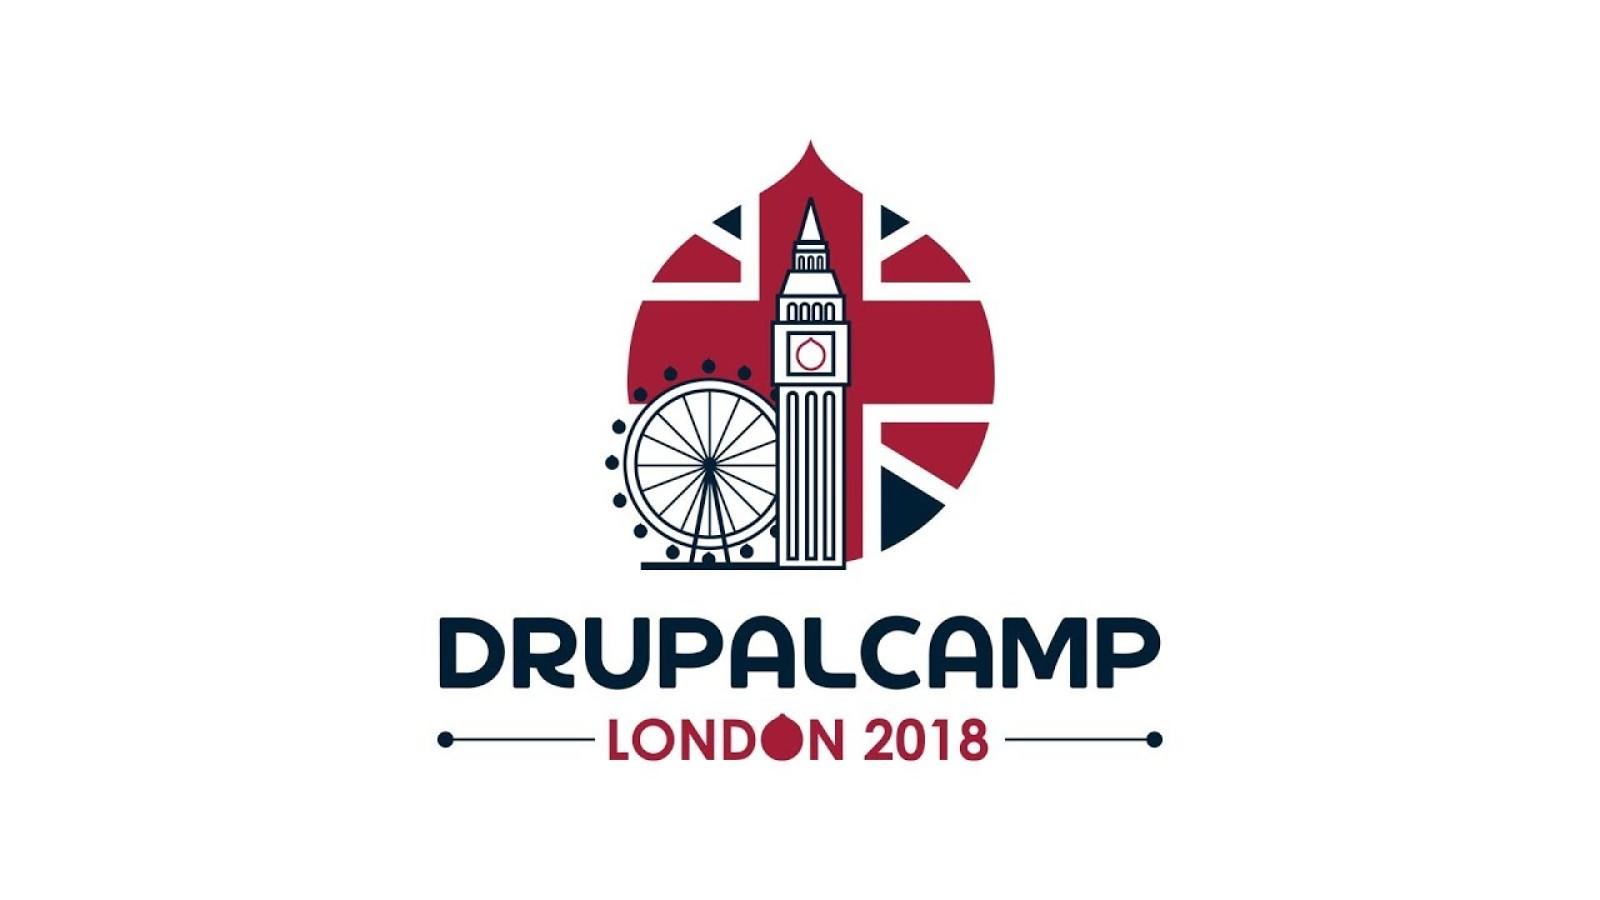 drupal camp london